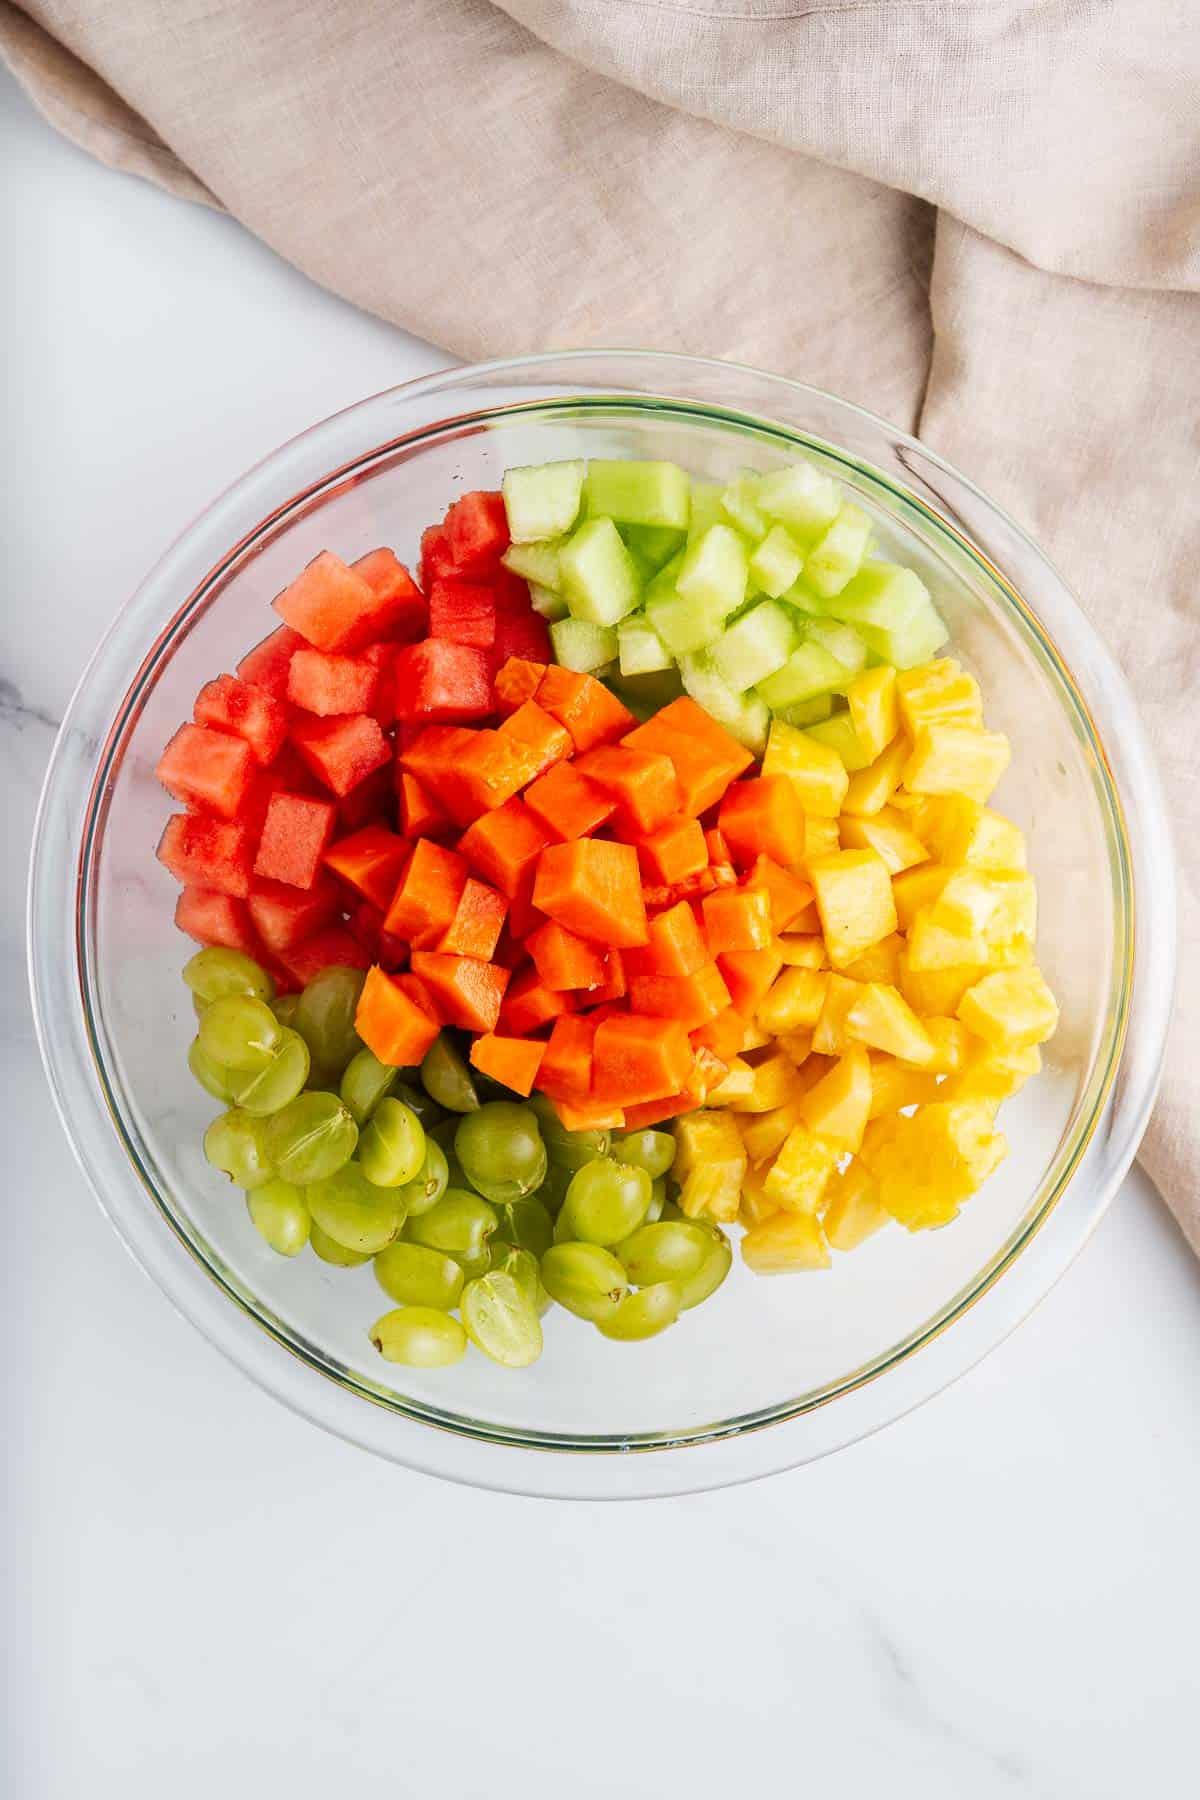 Chopped Fruit in a Mixing Bowl